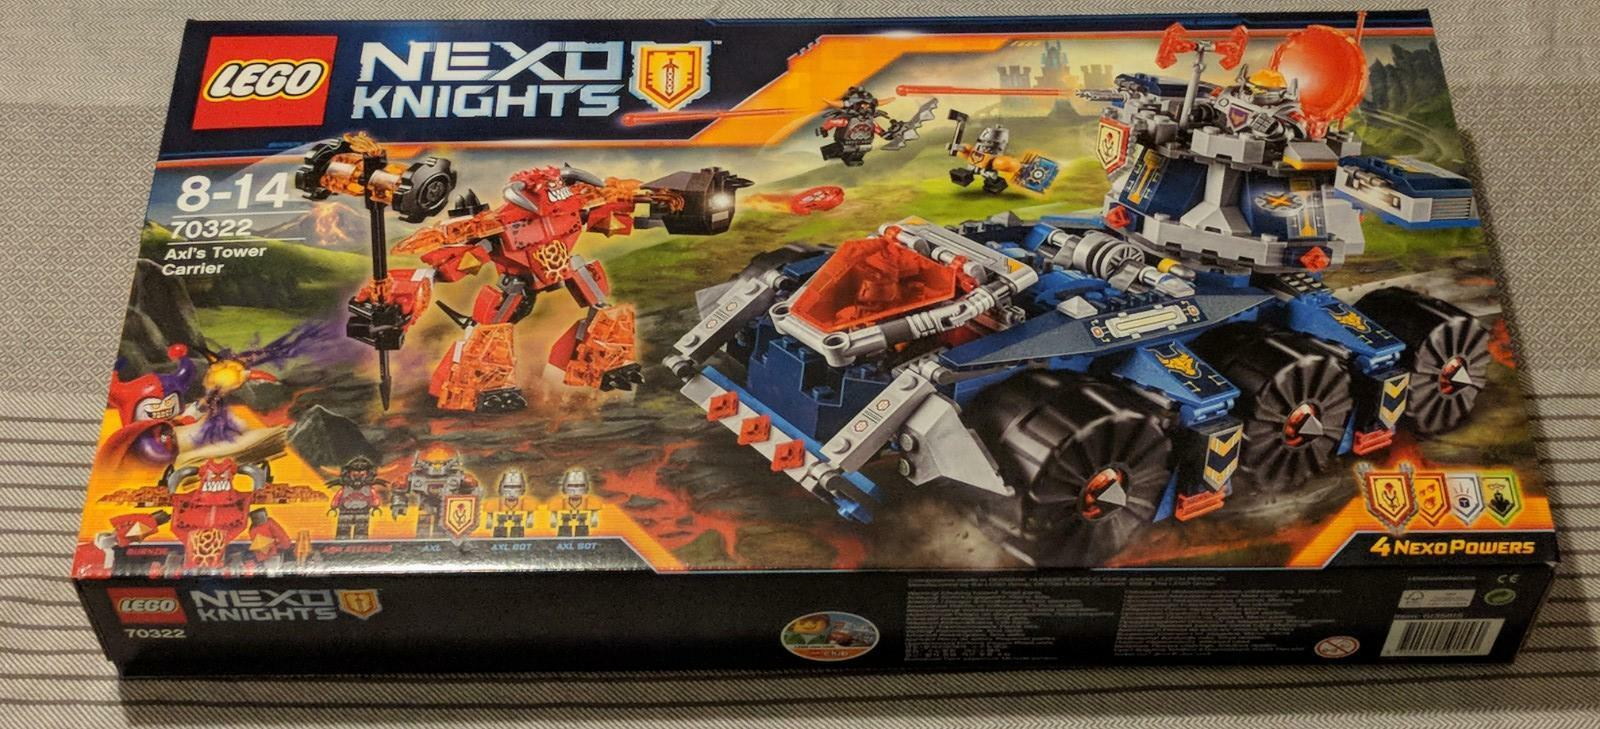 Lego 70322 Nexo Knights - Axls mobiler Grüneidigungsturm